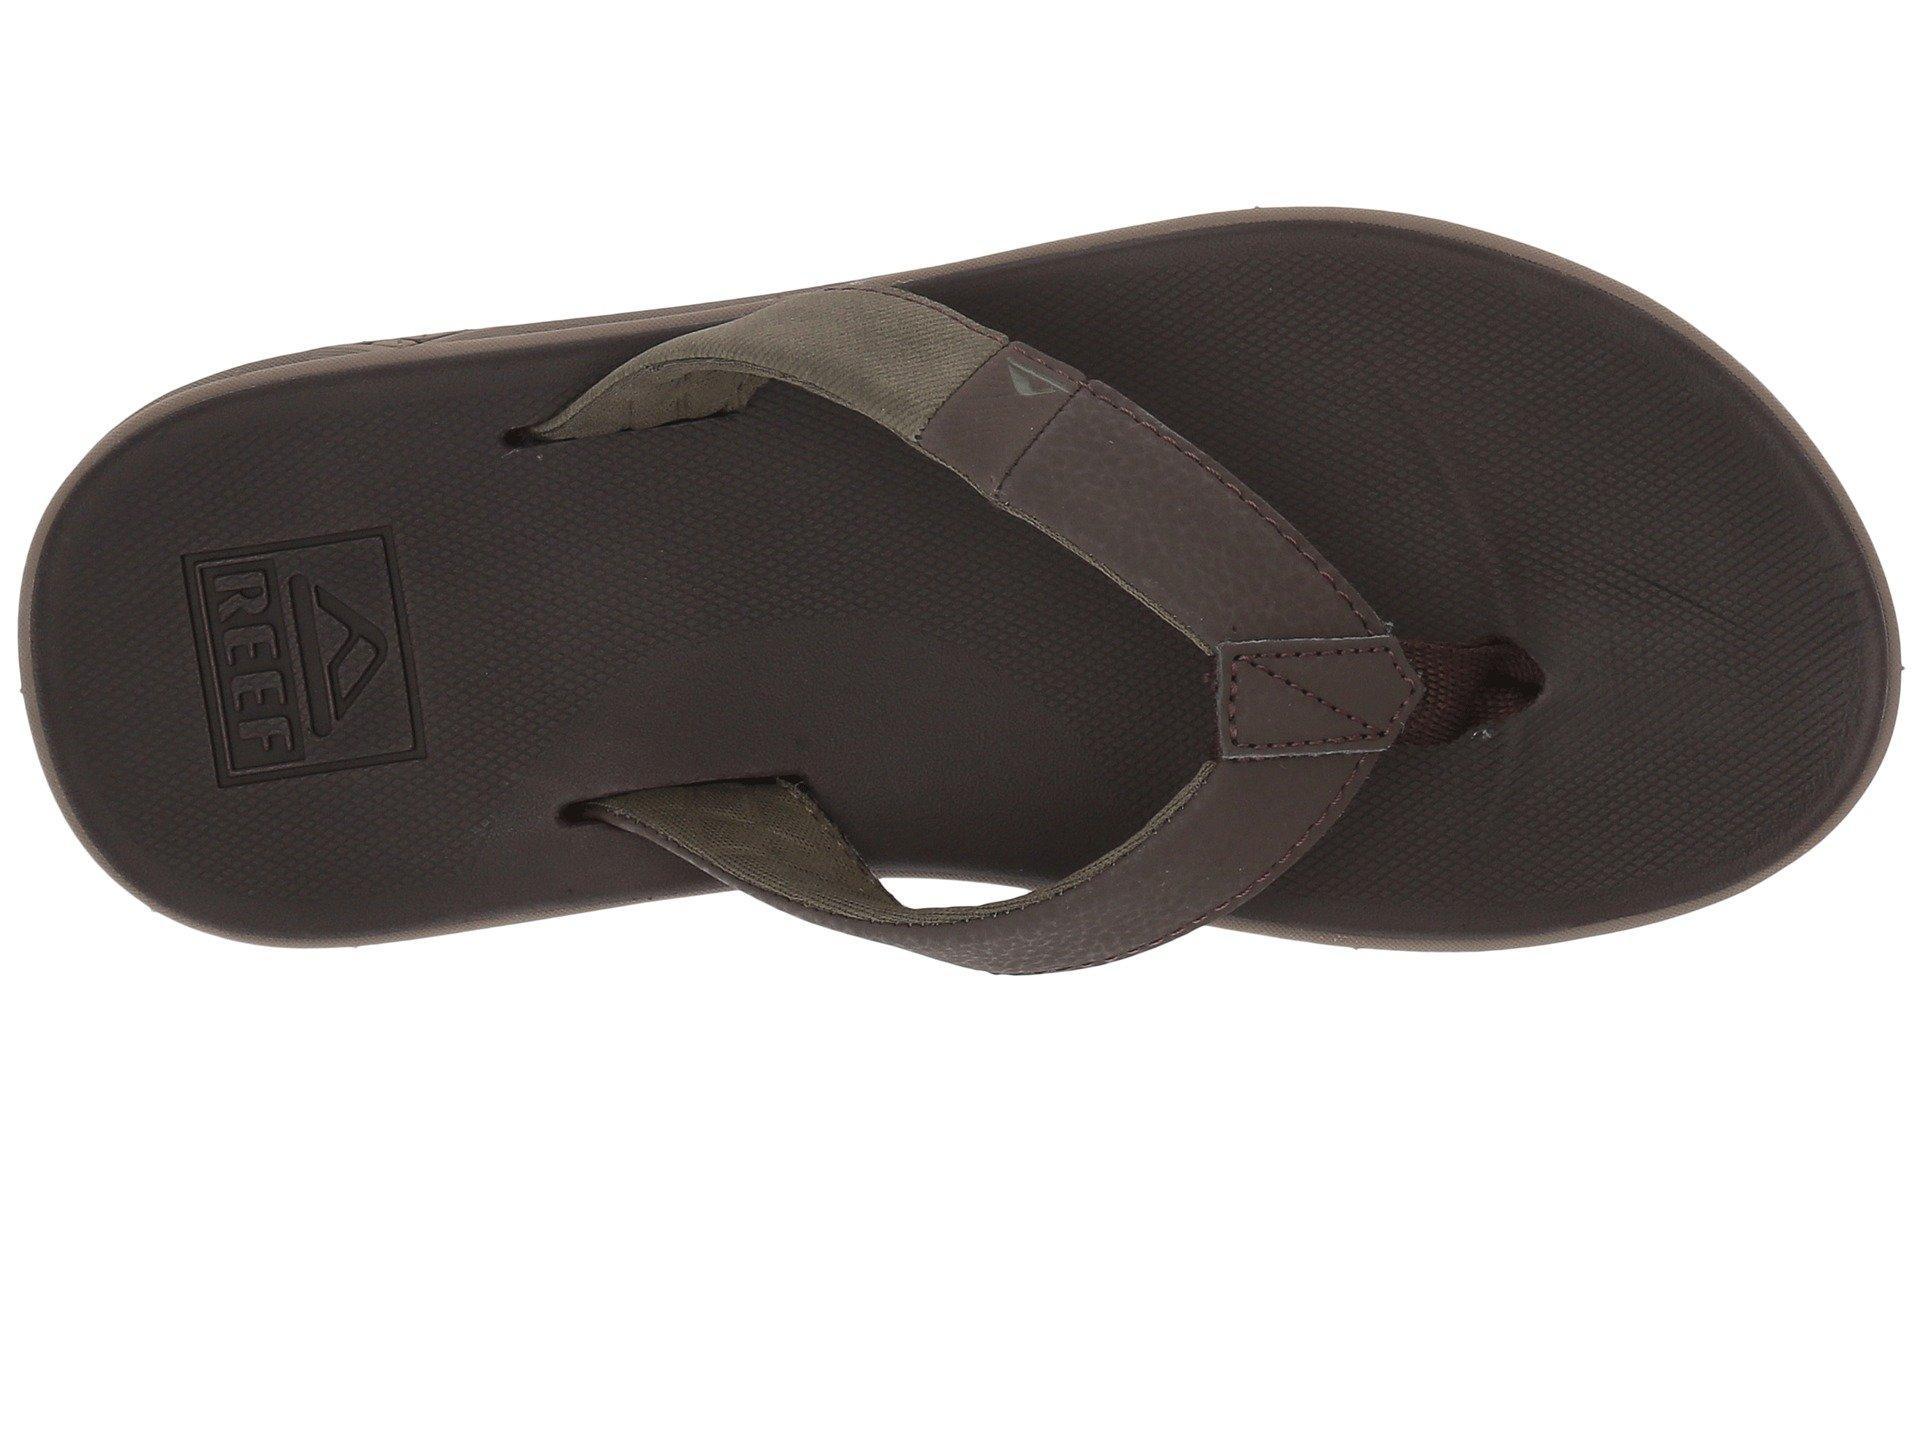 79079d5cde95 Reef - Brown Slammed Rover (grey black red) Men s Sandals for Men. View  fullscreen